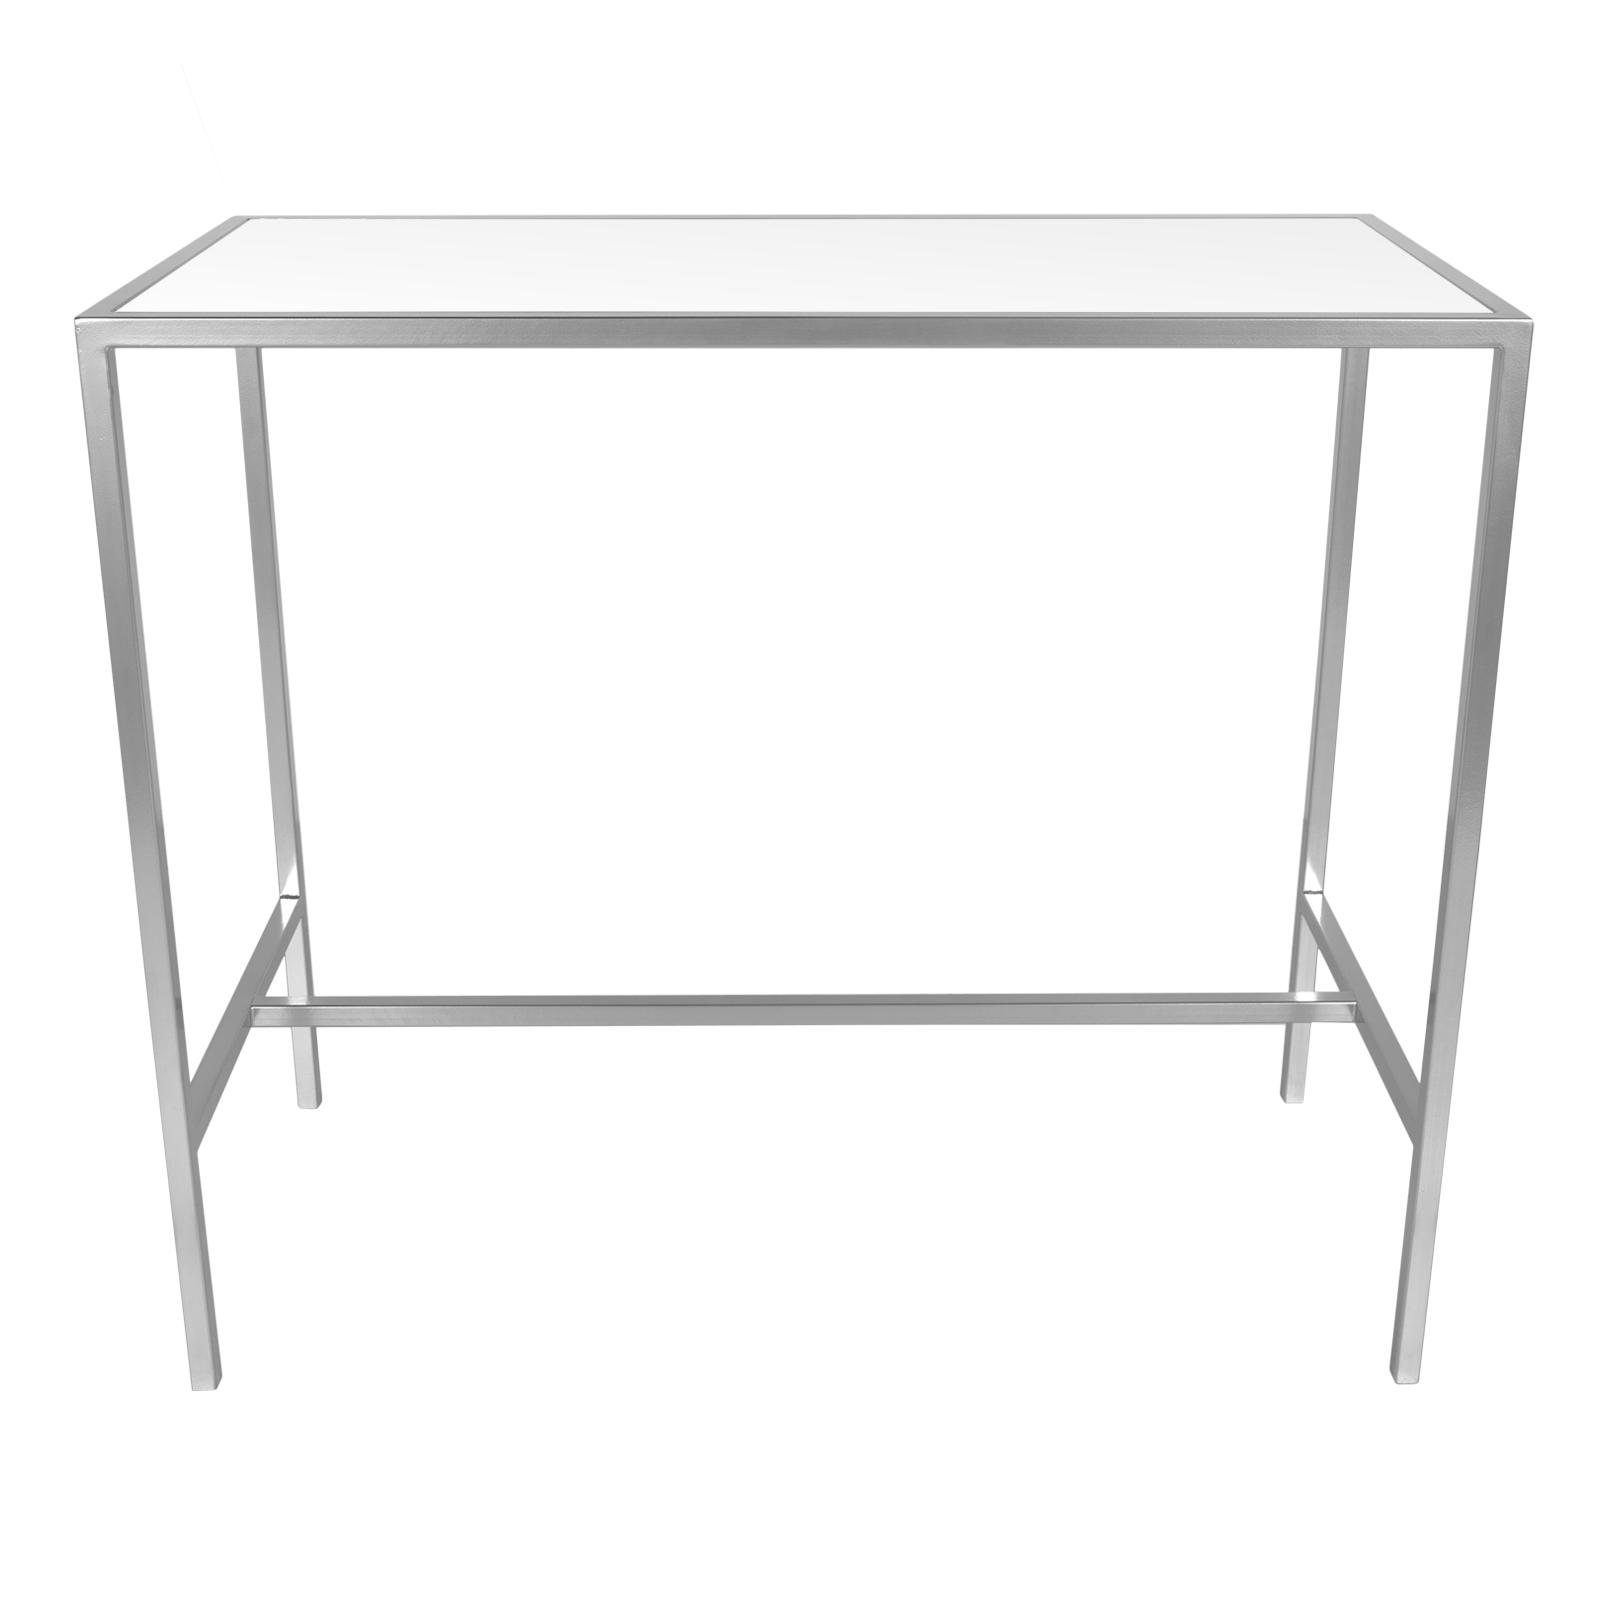 Formdecor bar table rental trade show furniture